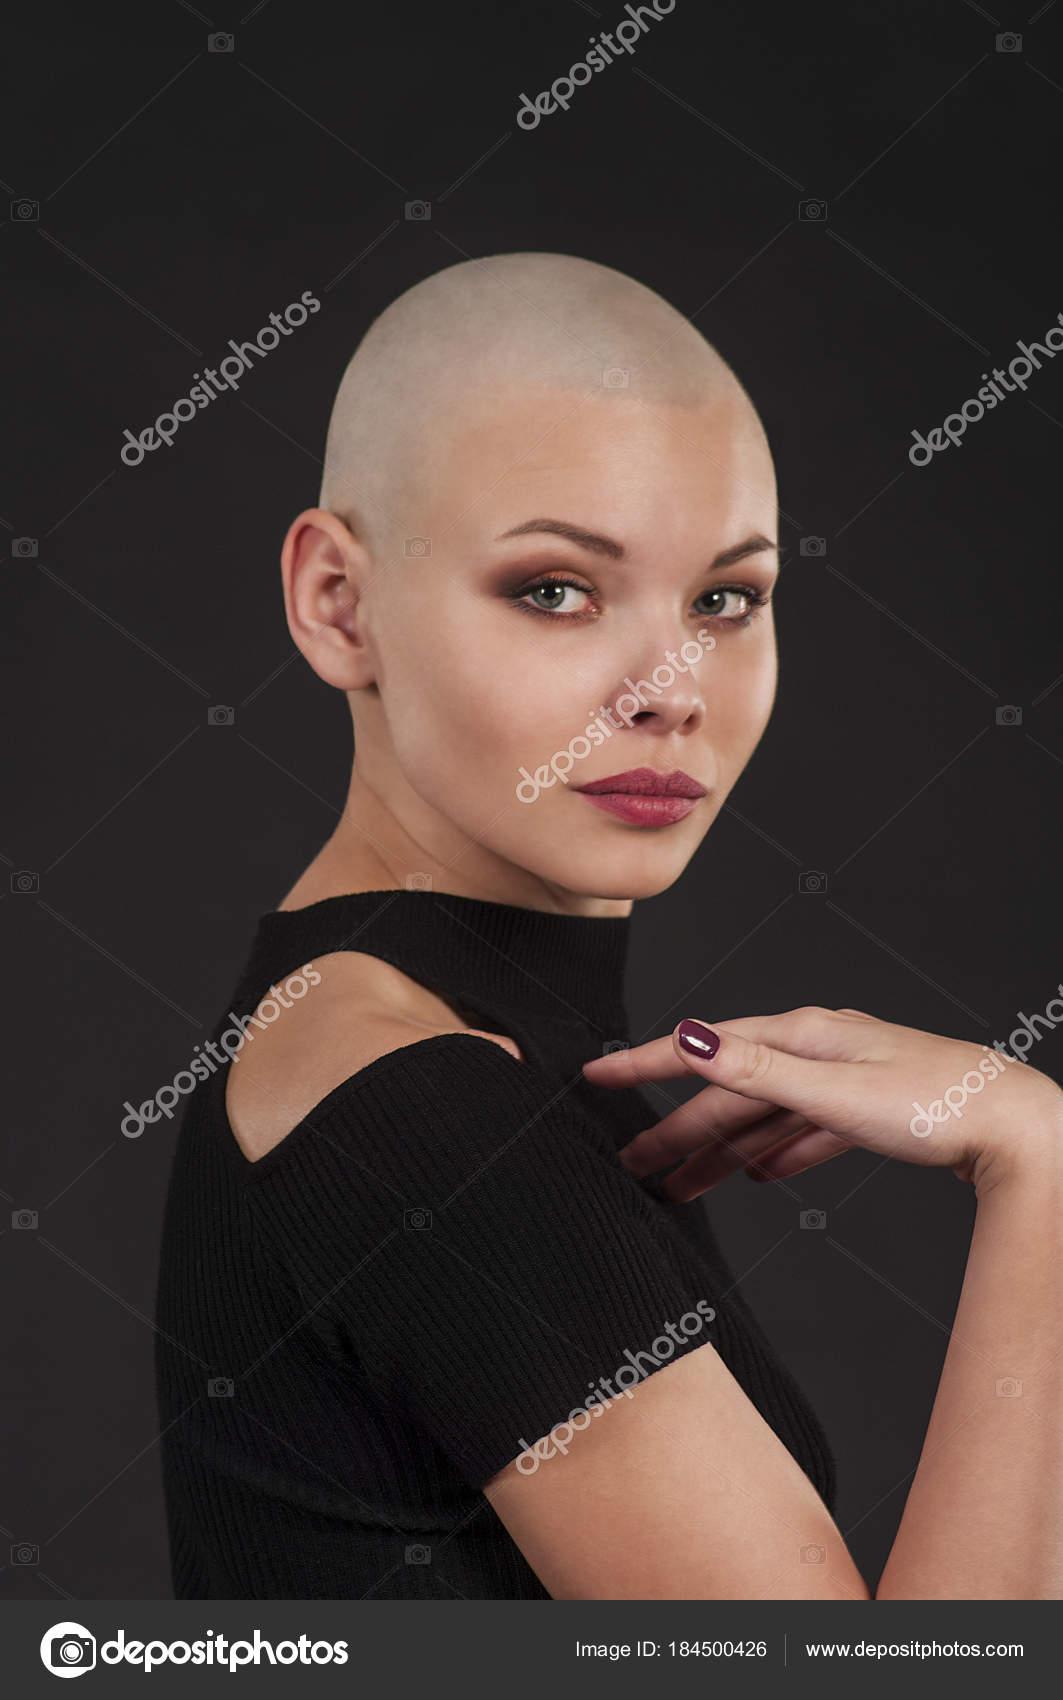 Emotional portrait of a naked girl shaved bald. — Stock